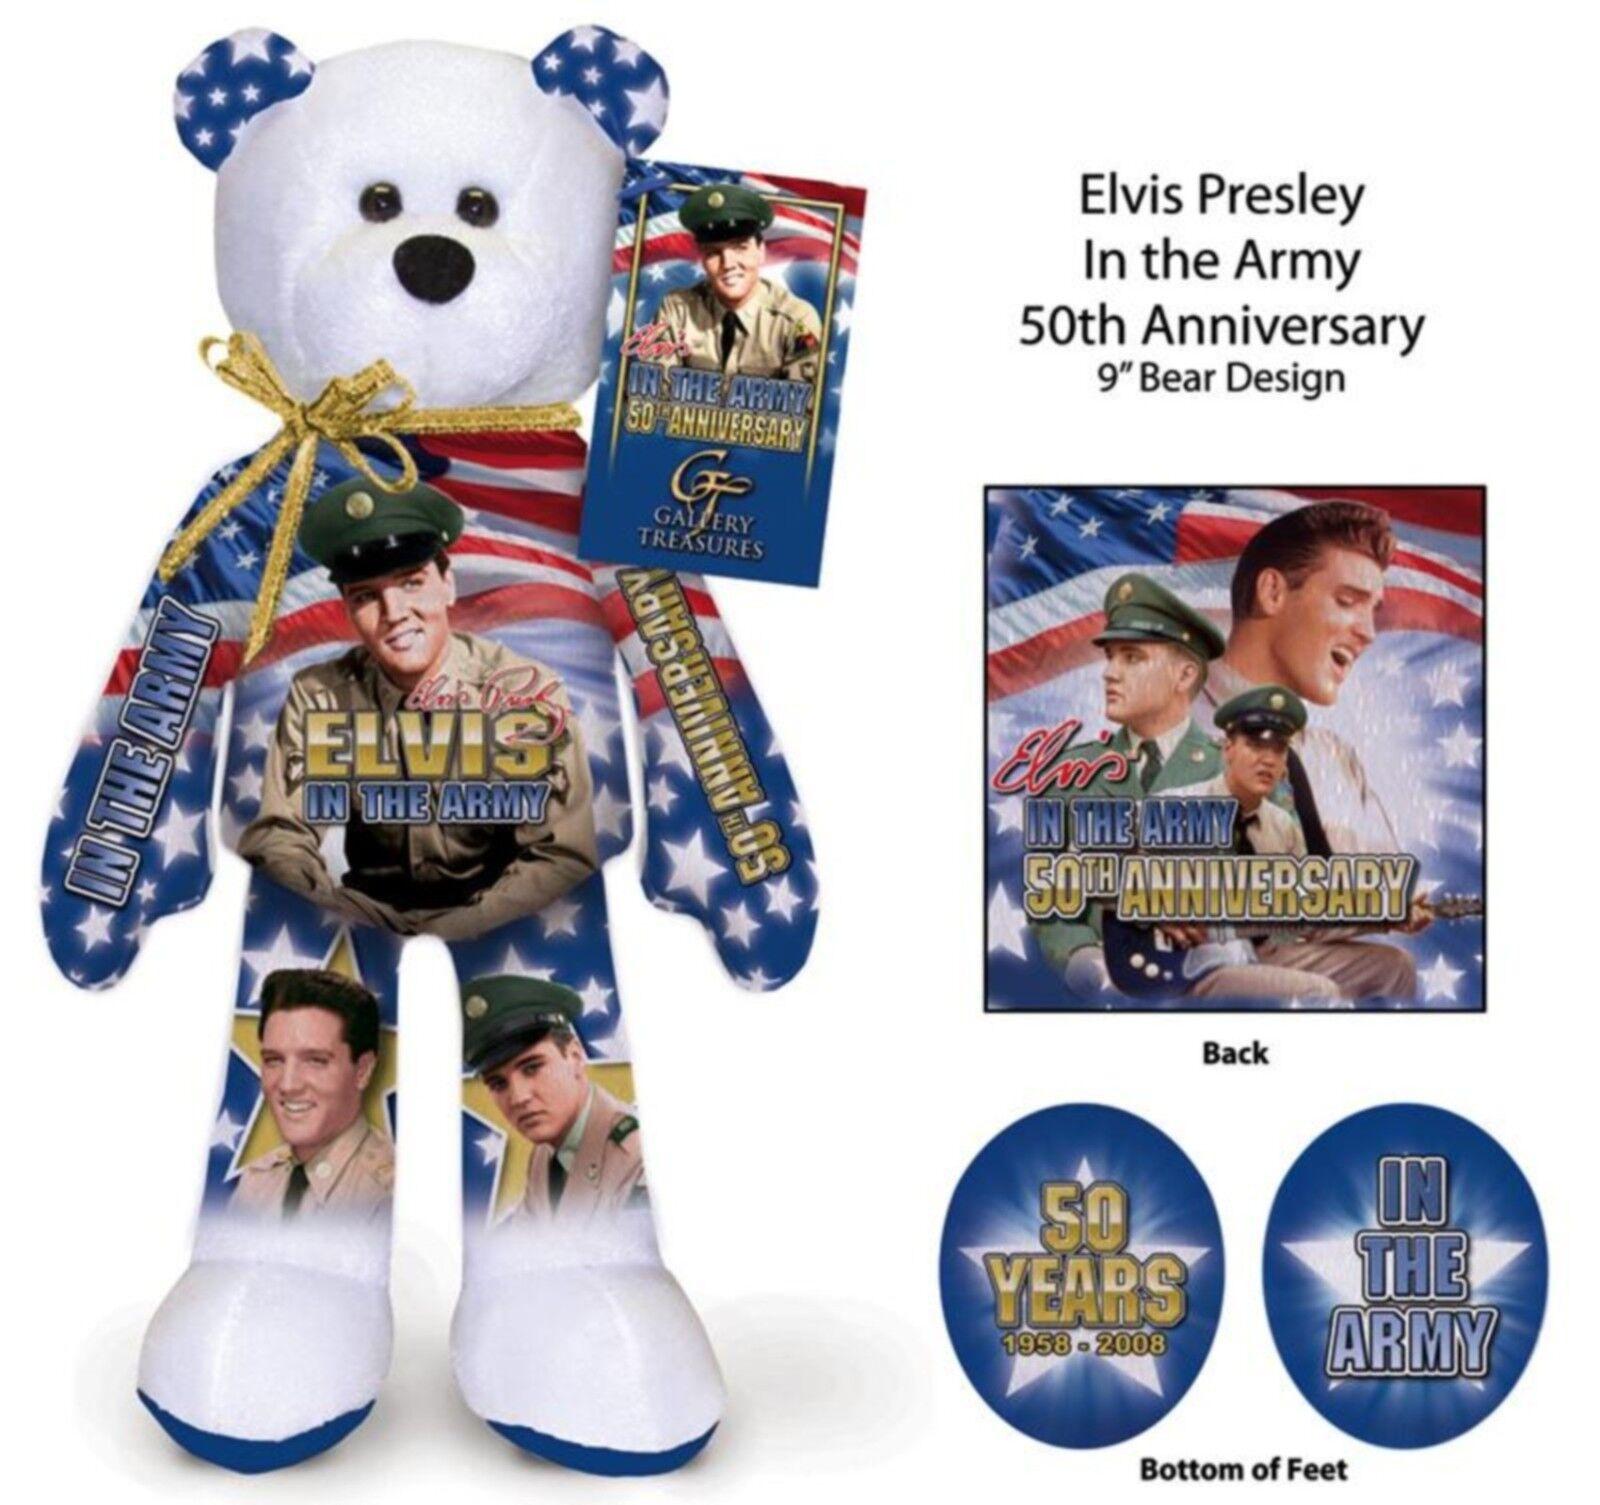 Elvis Presley 50th Anniversary US Army Teddy bear